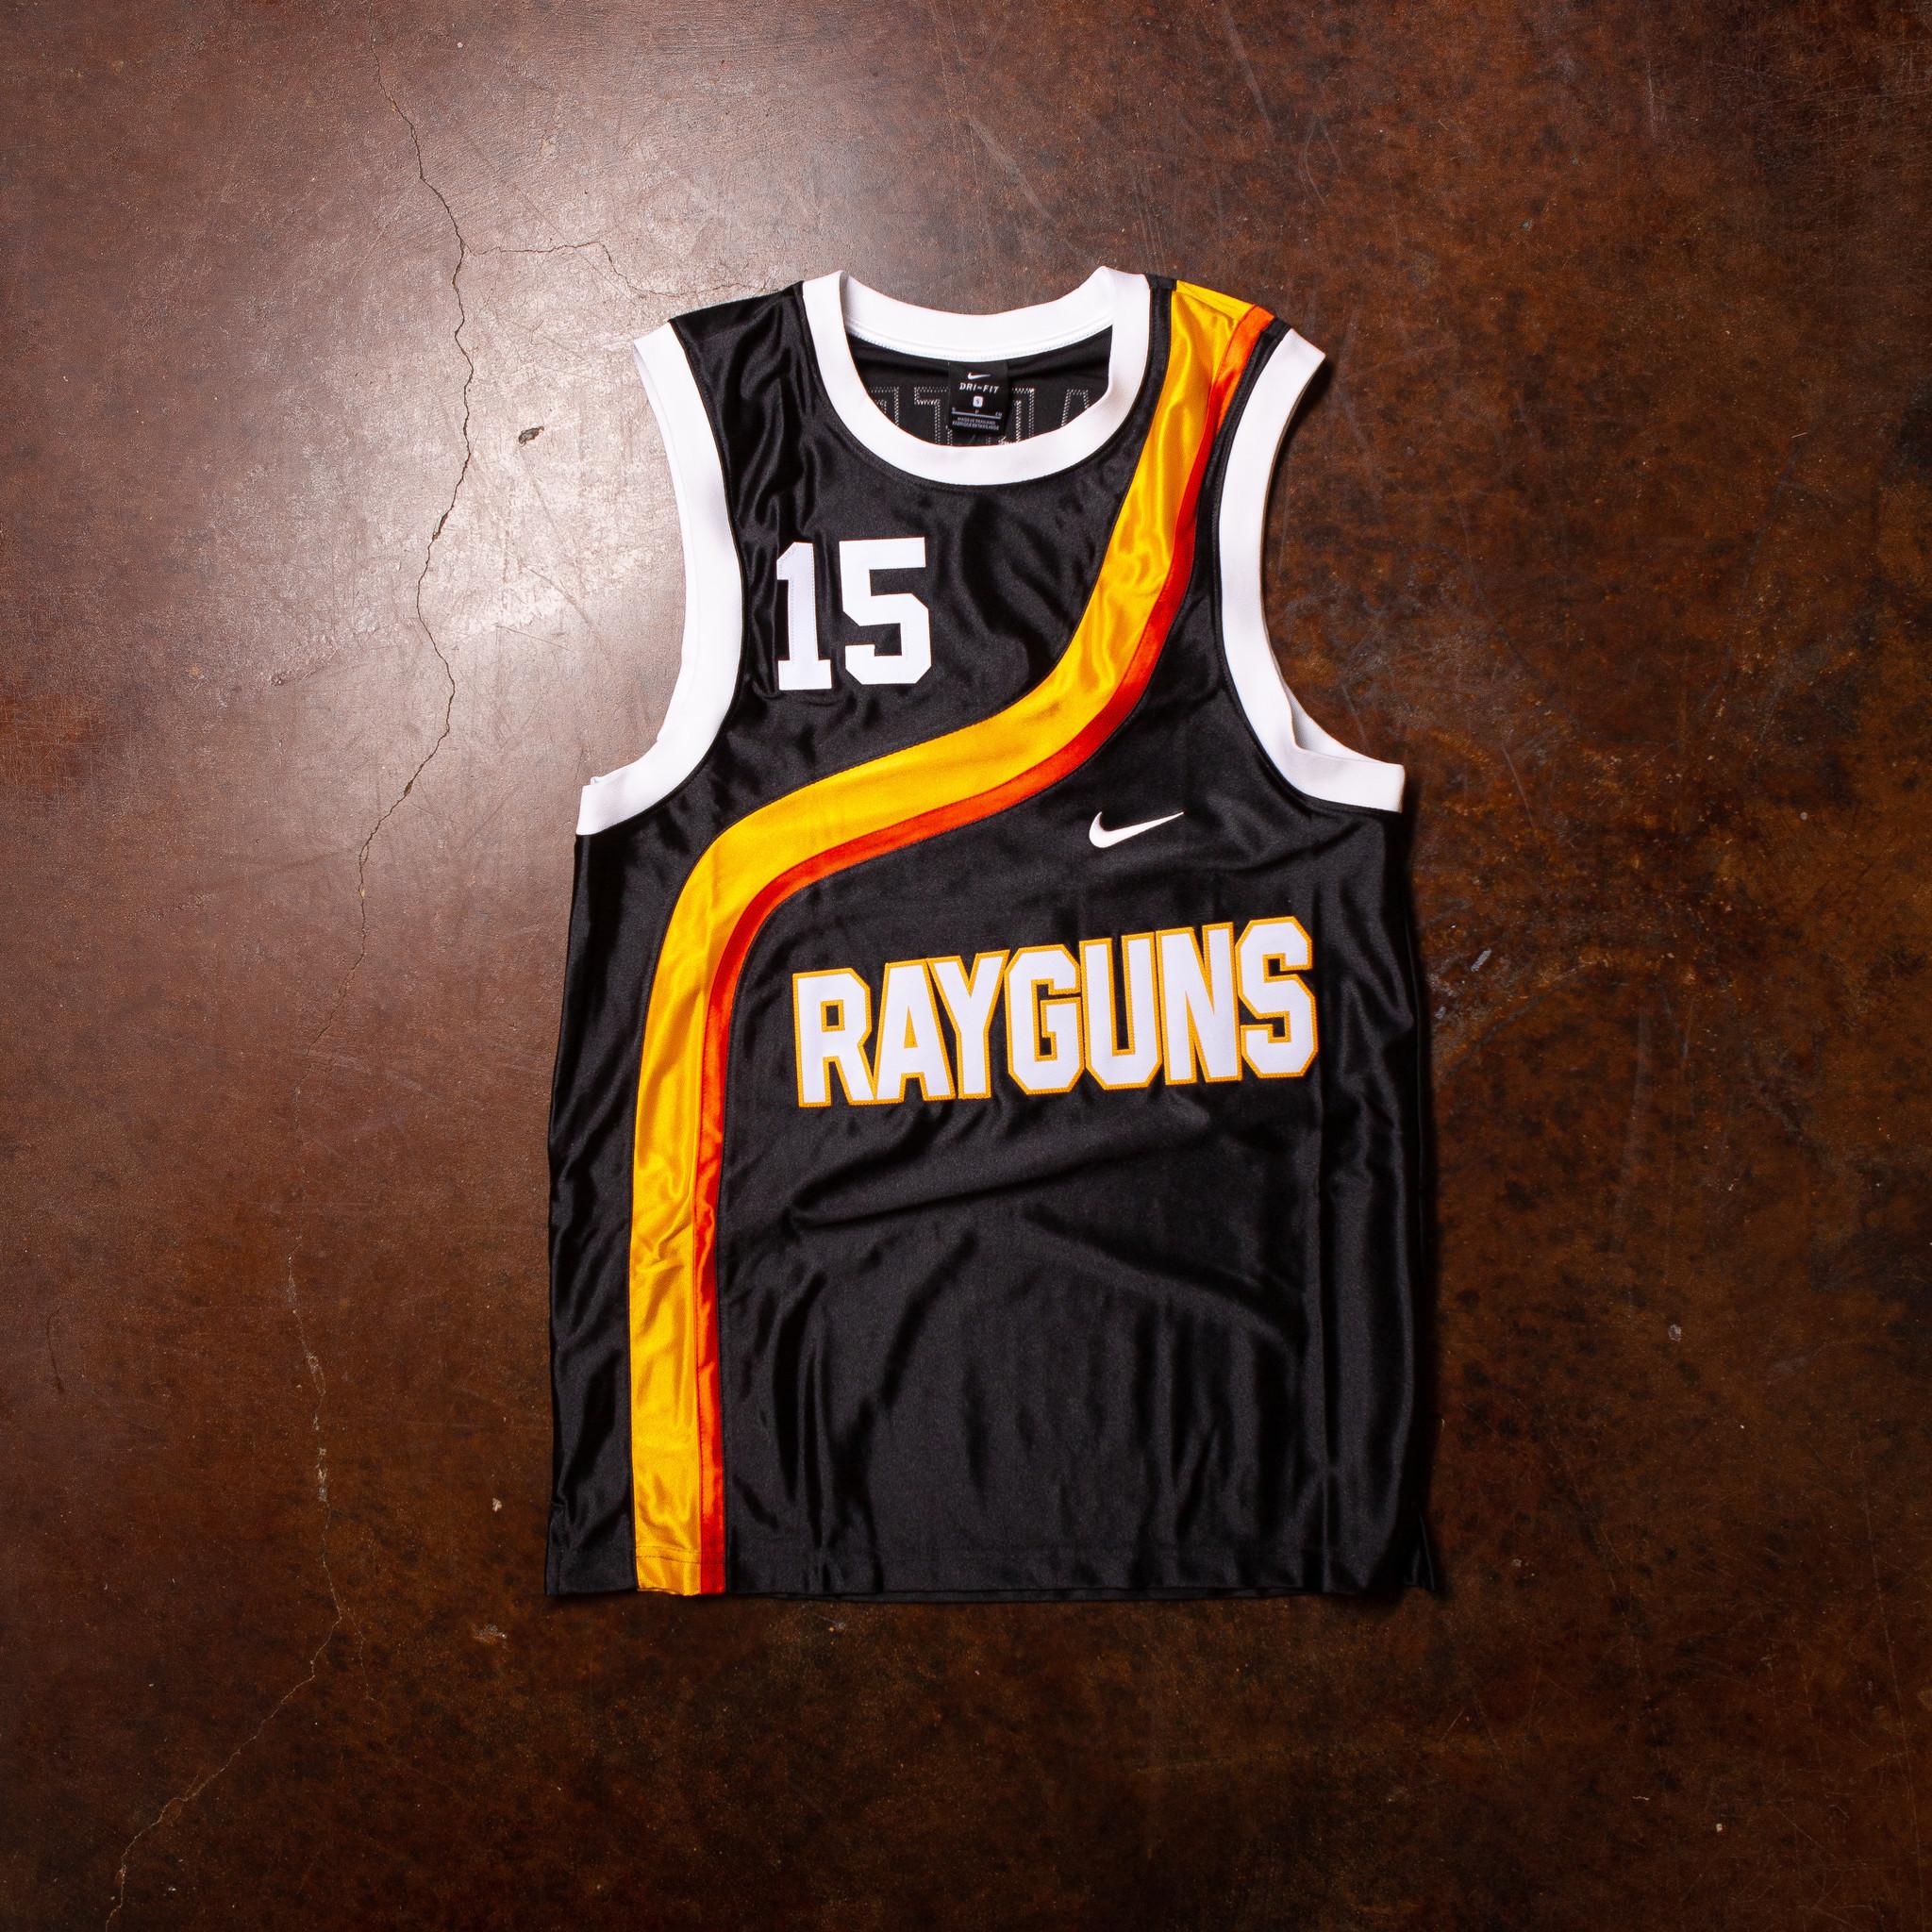 Nike Nike Raygun Jersey Black